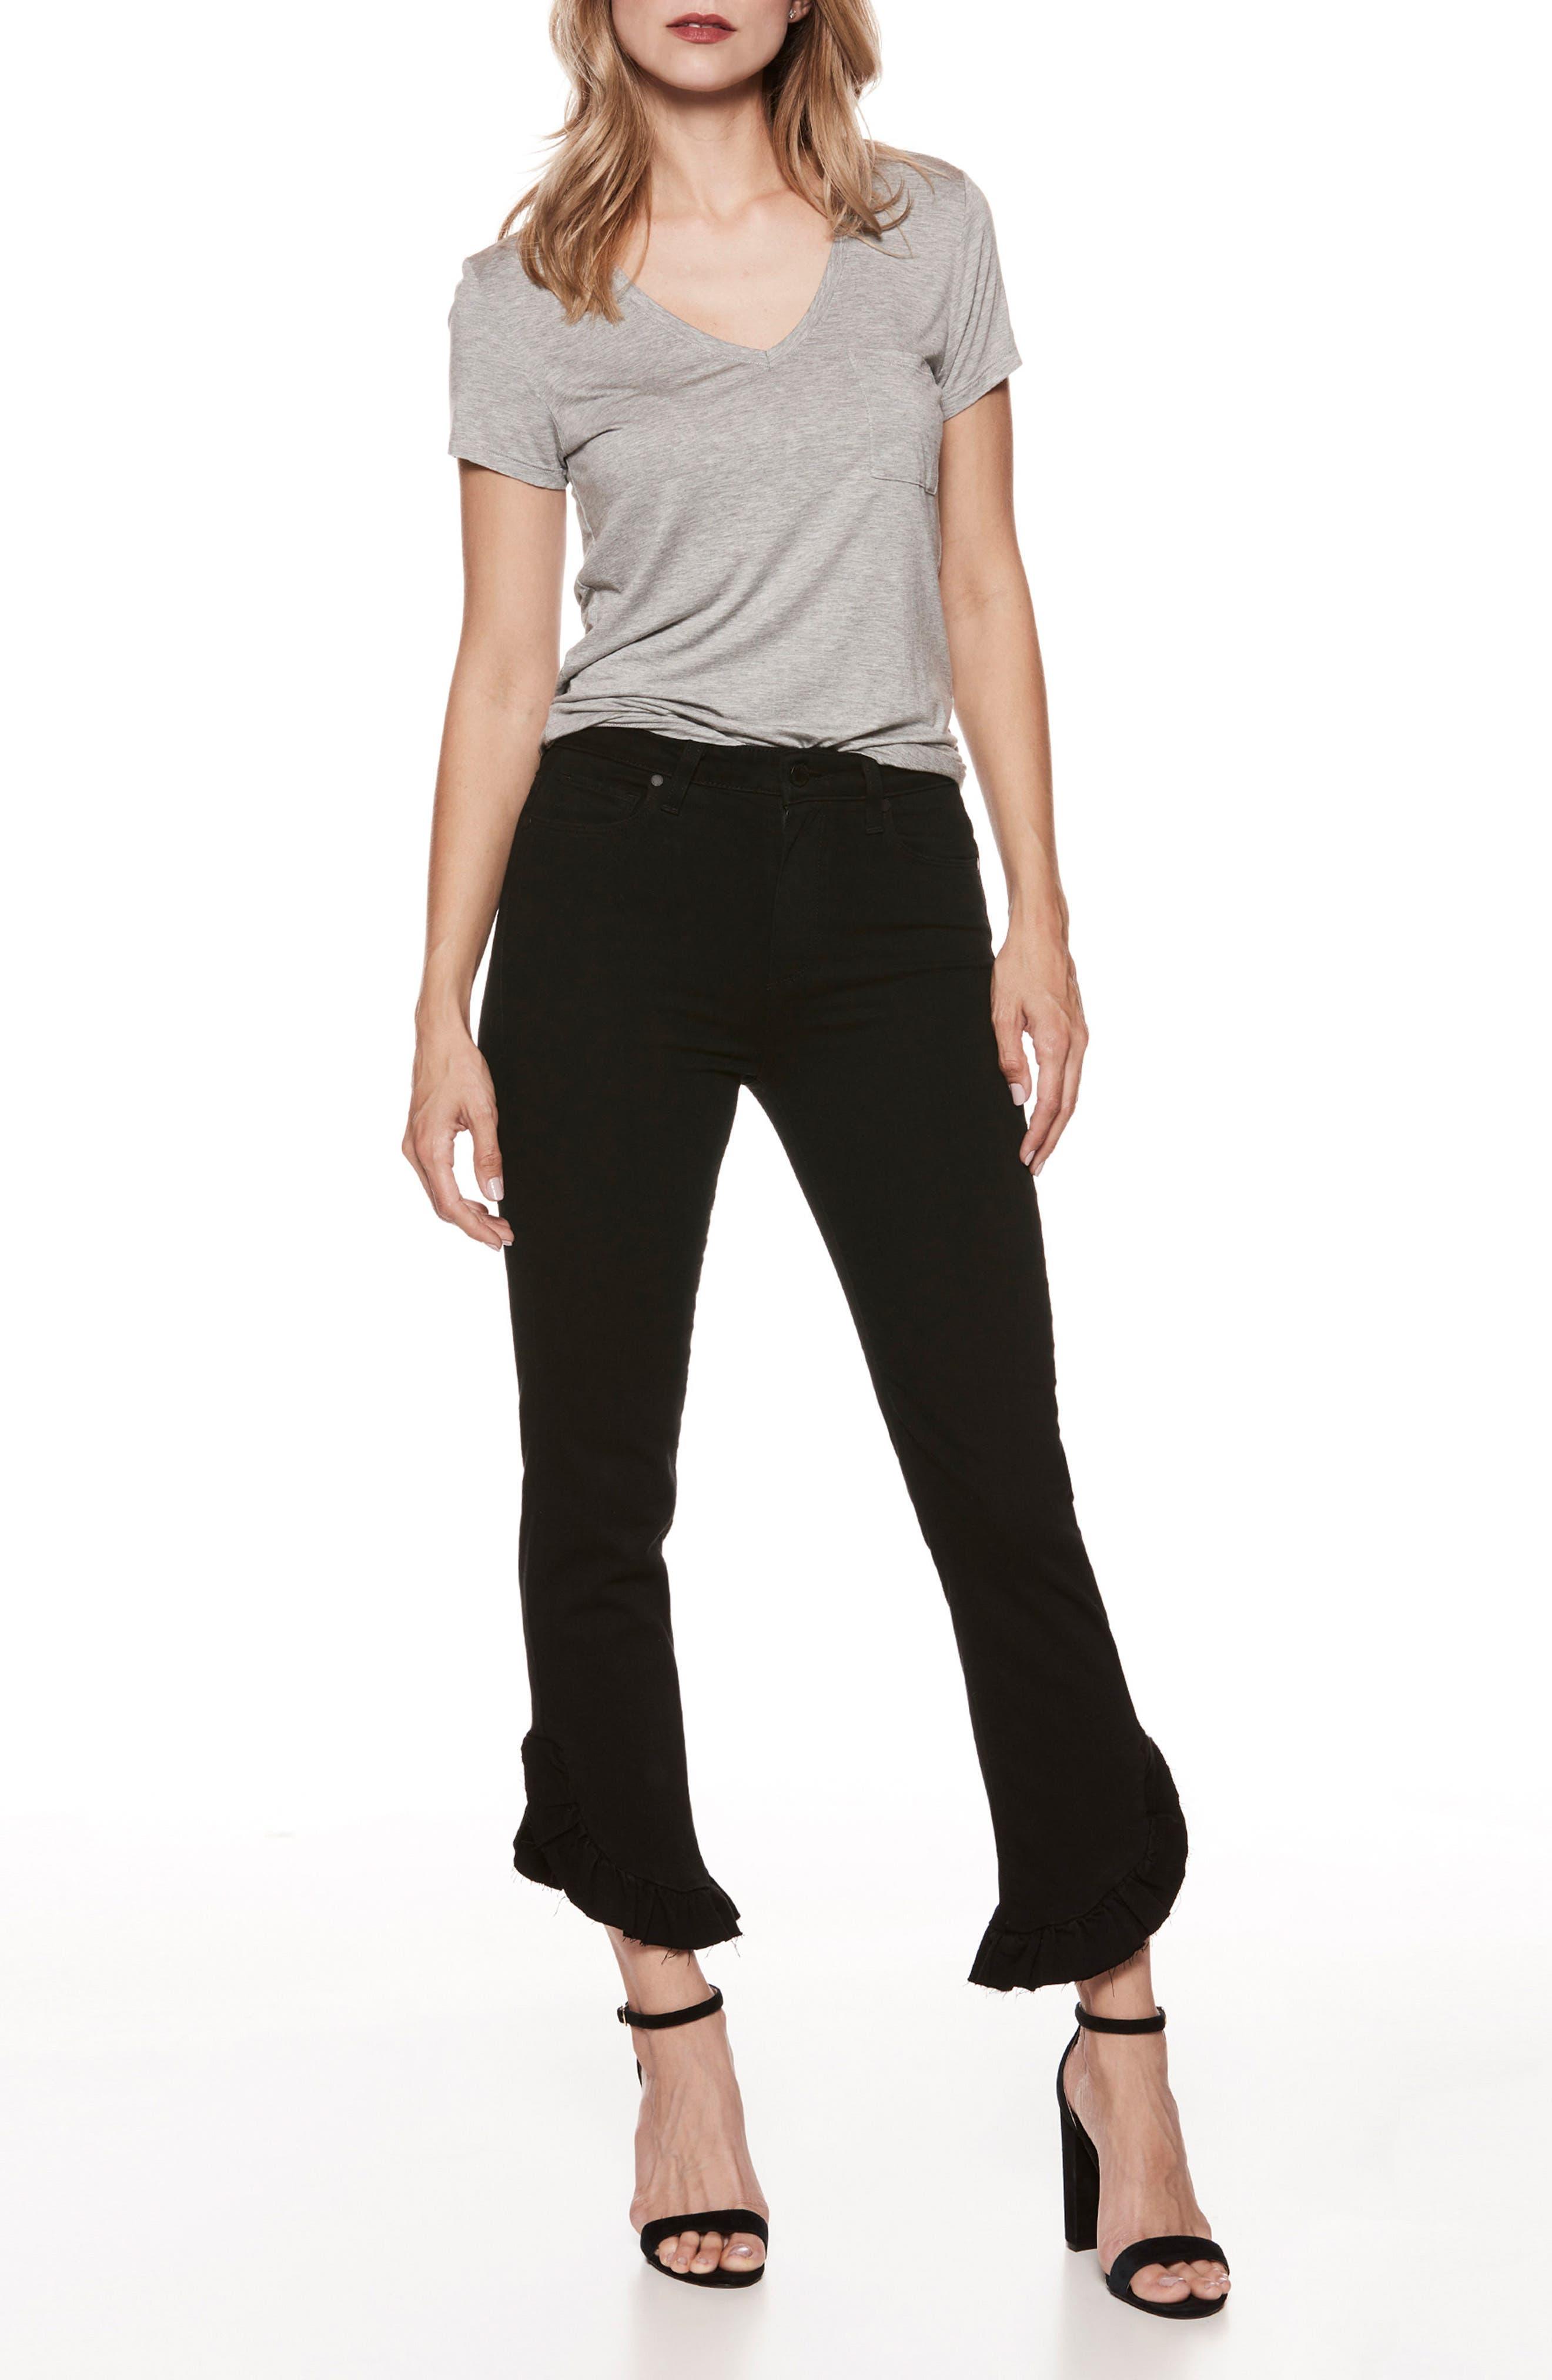 Transcend - Hoxton High Waist Ankle Straight Leg Jeans,                             Alternate thumbnail 5, color,                             001